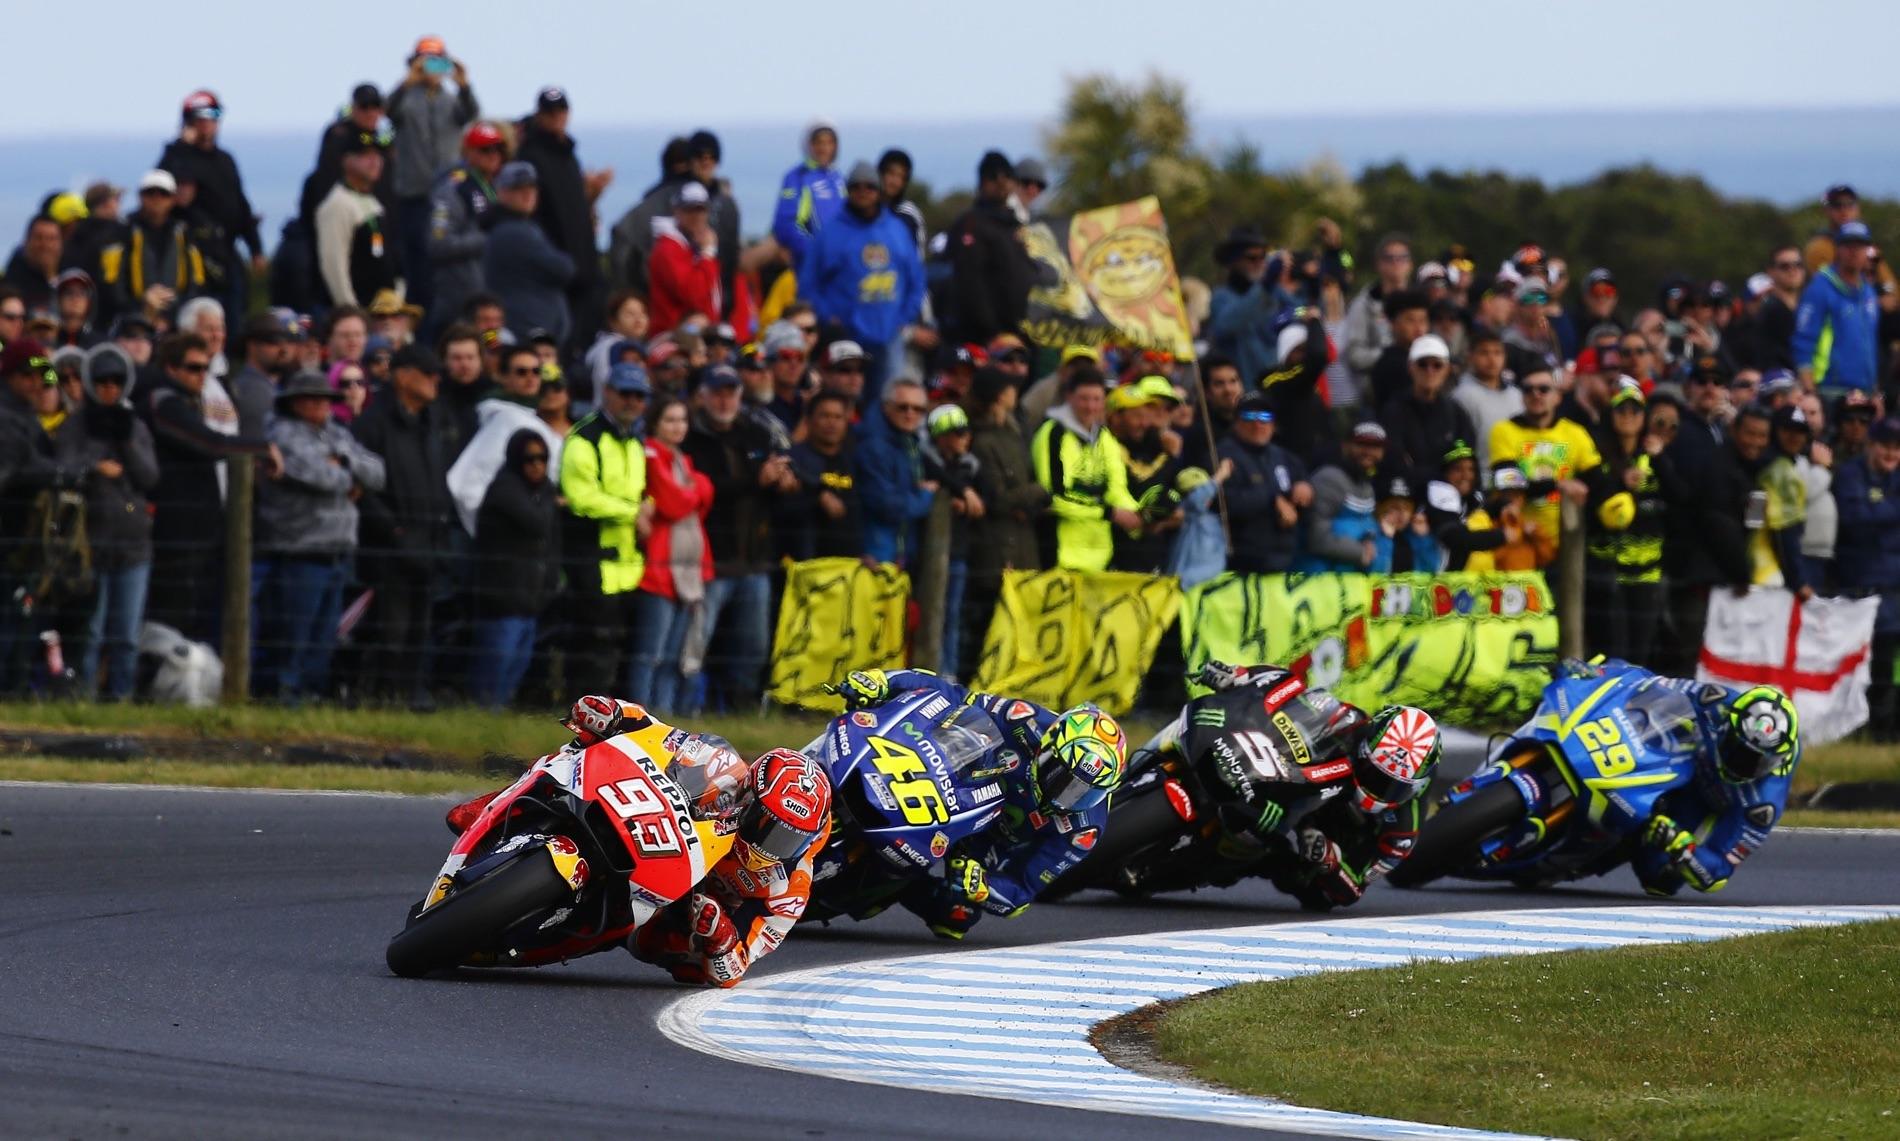 Lo mejor de la carrera de MotoGP Australia 2017